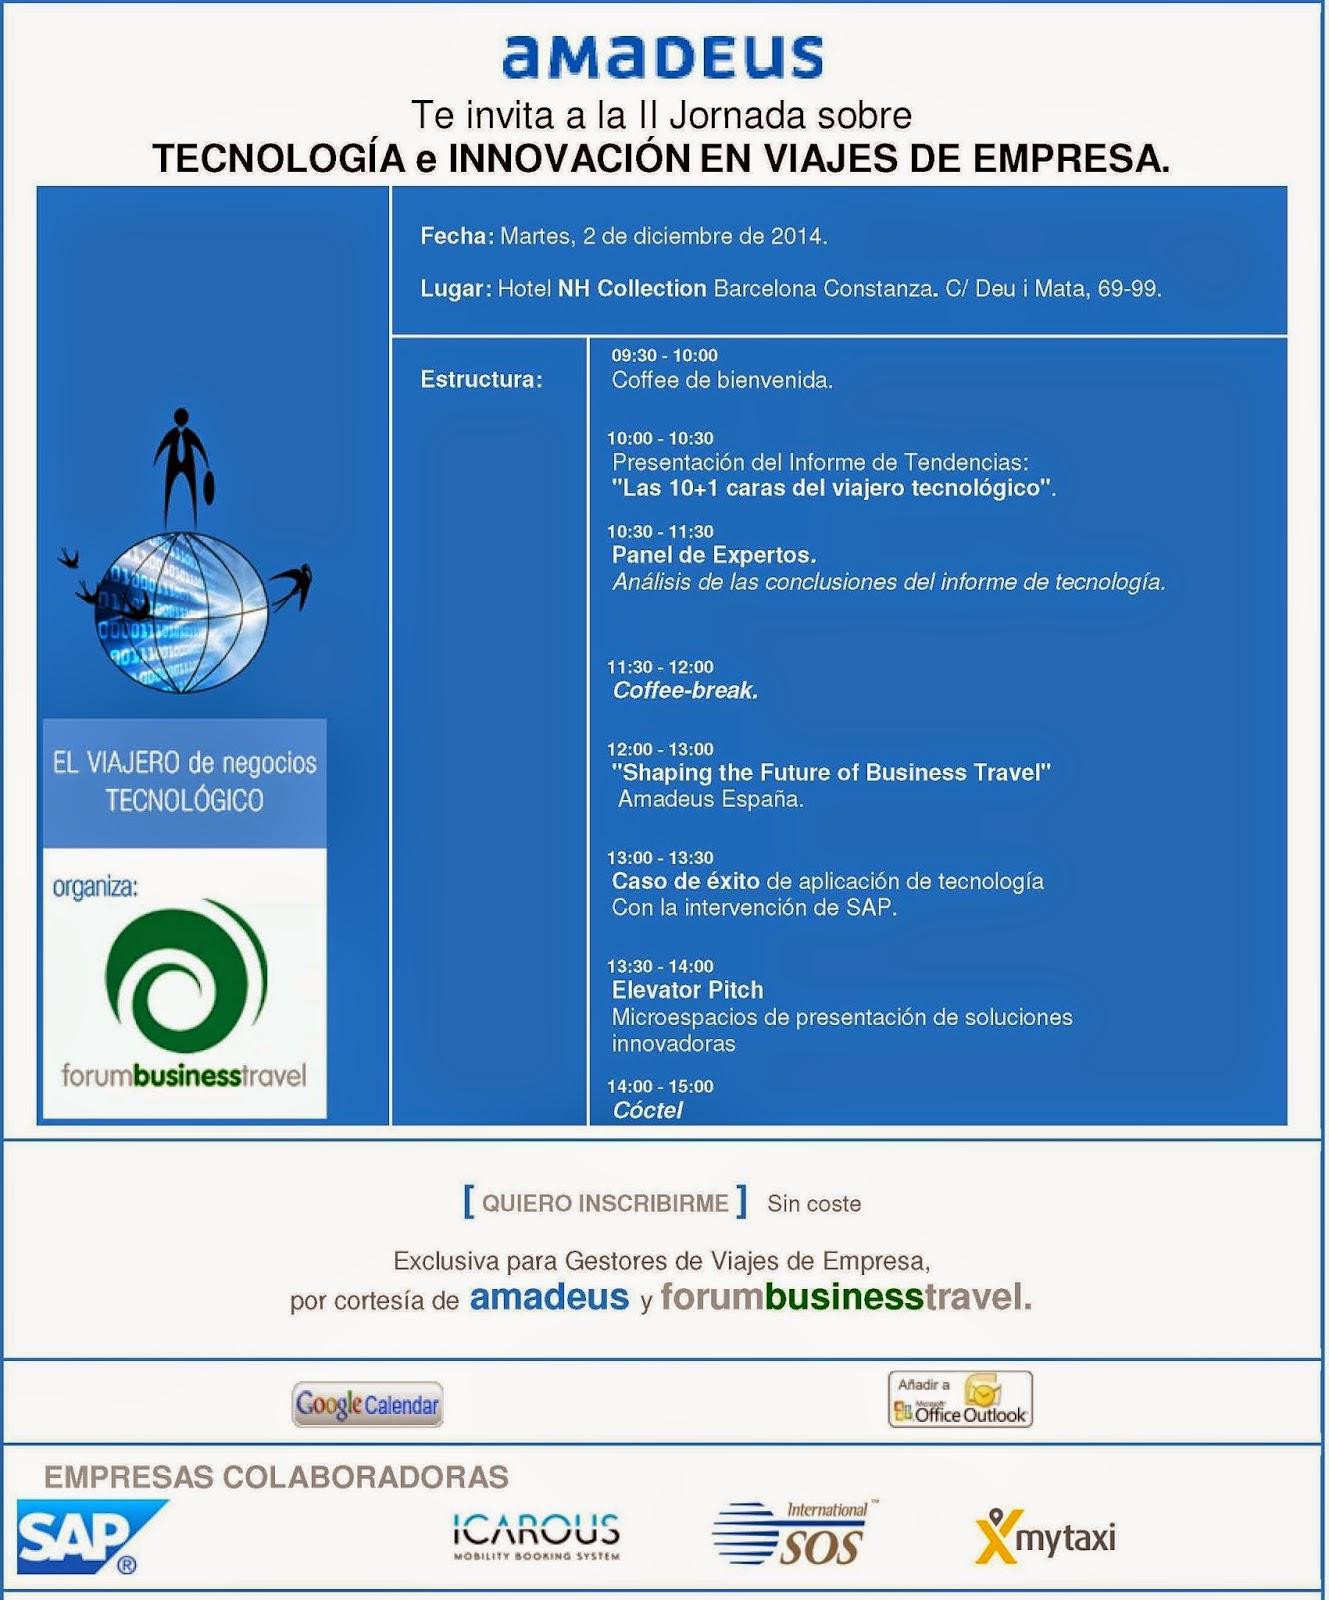 http://www.newsletterforumbusinesstravel.com/mail/S_Otras/Tecnologia_Amadeus_2014/Tecnologia_BCN_02.12.14.html